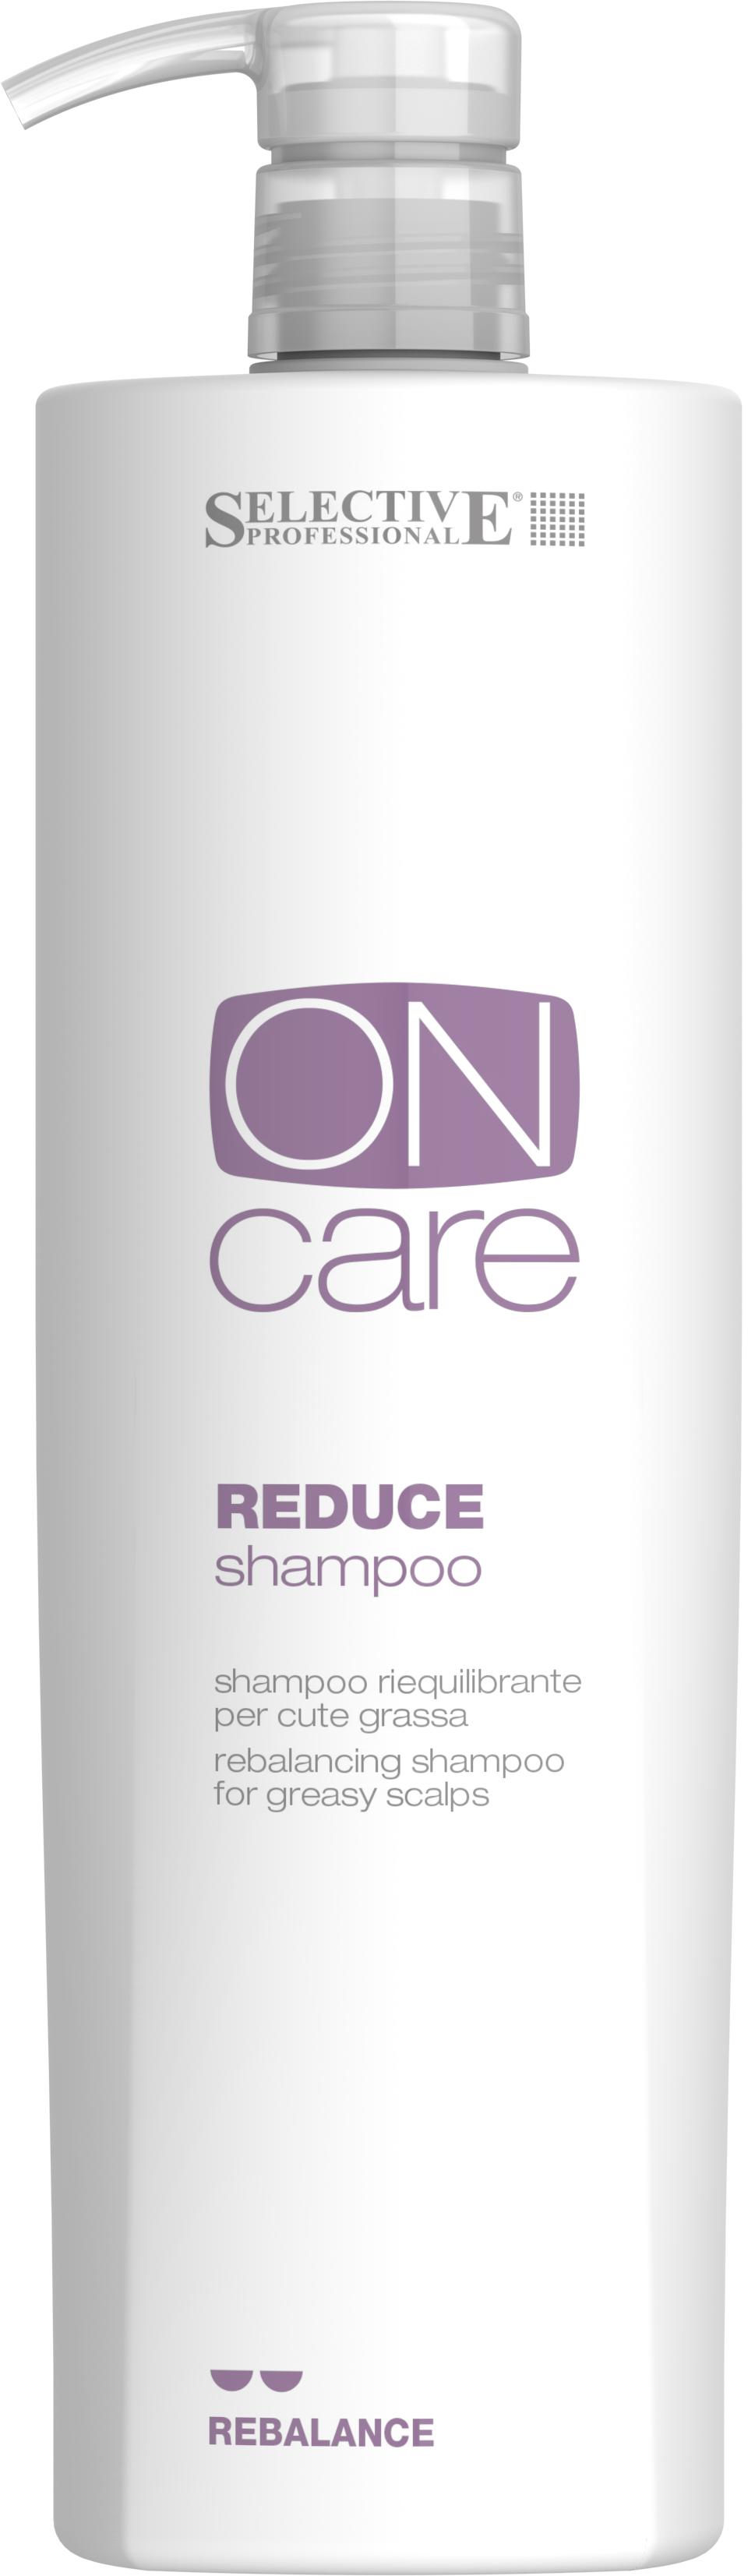 SELECTIVE PROFESSIONAL Шампунь восстанавливающий баланс жирной кожи головы / On Care Rebalance 1000 мл